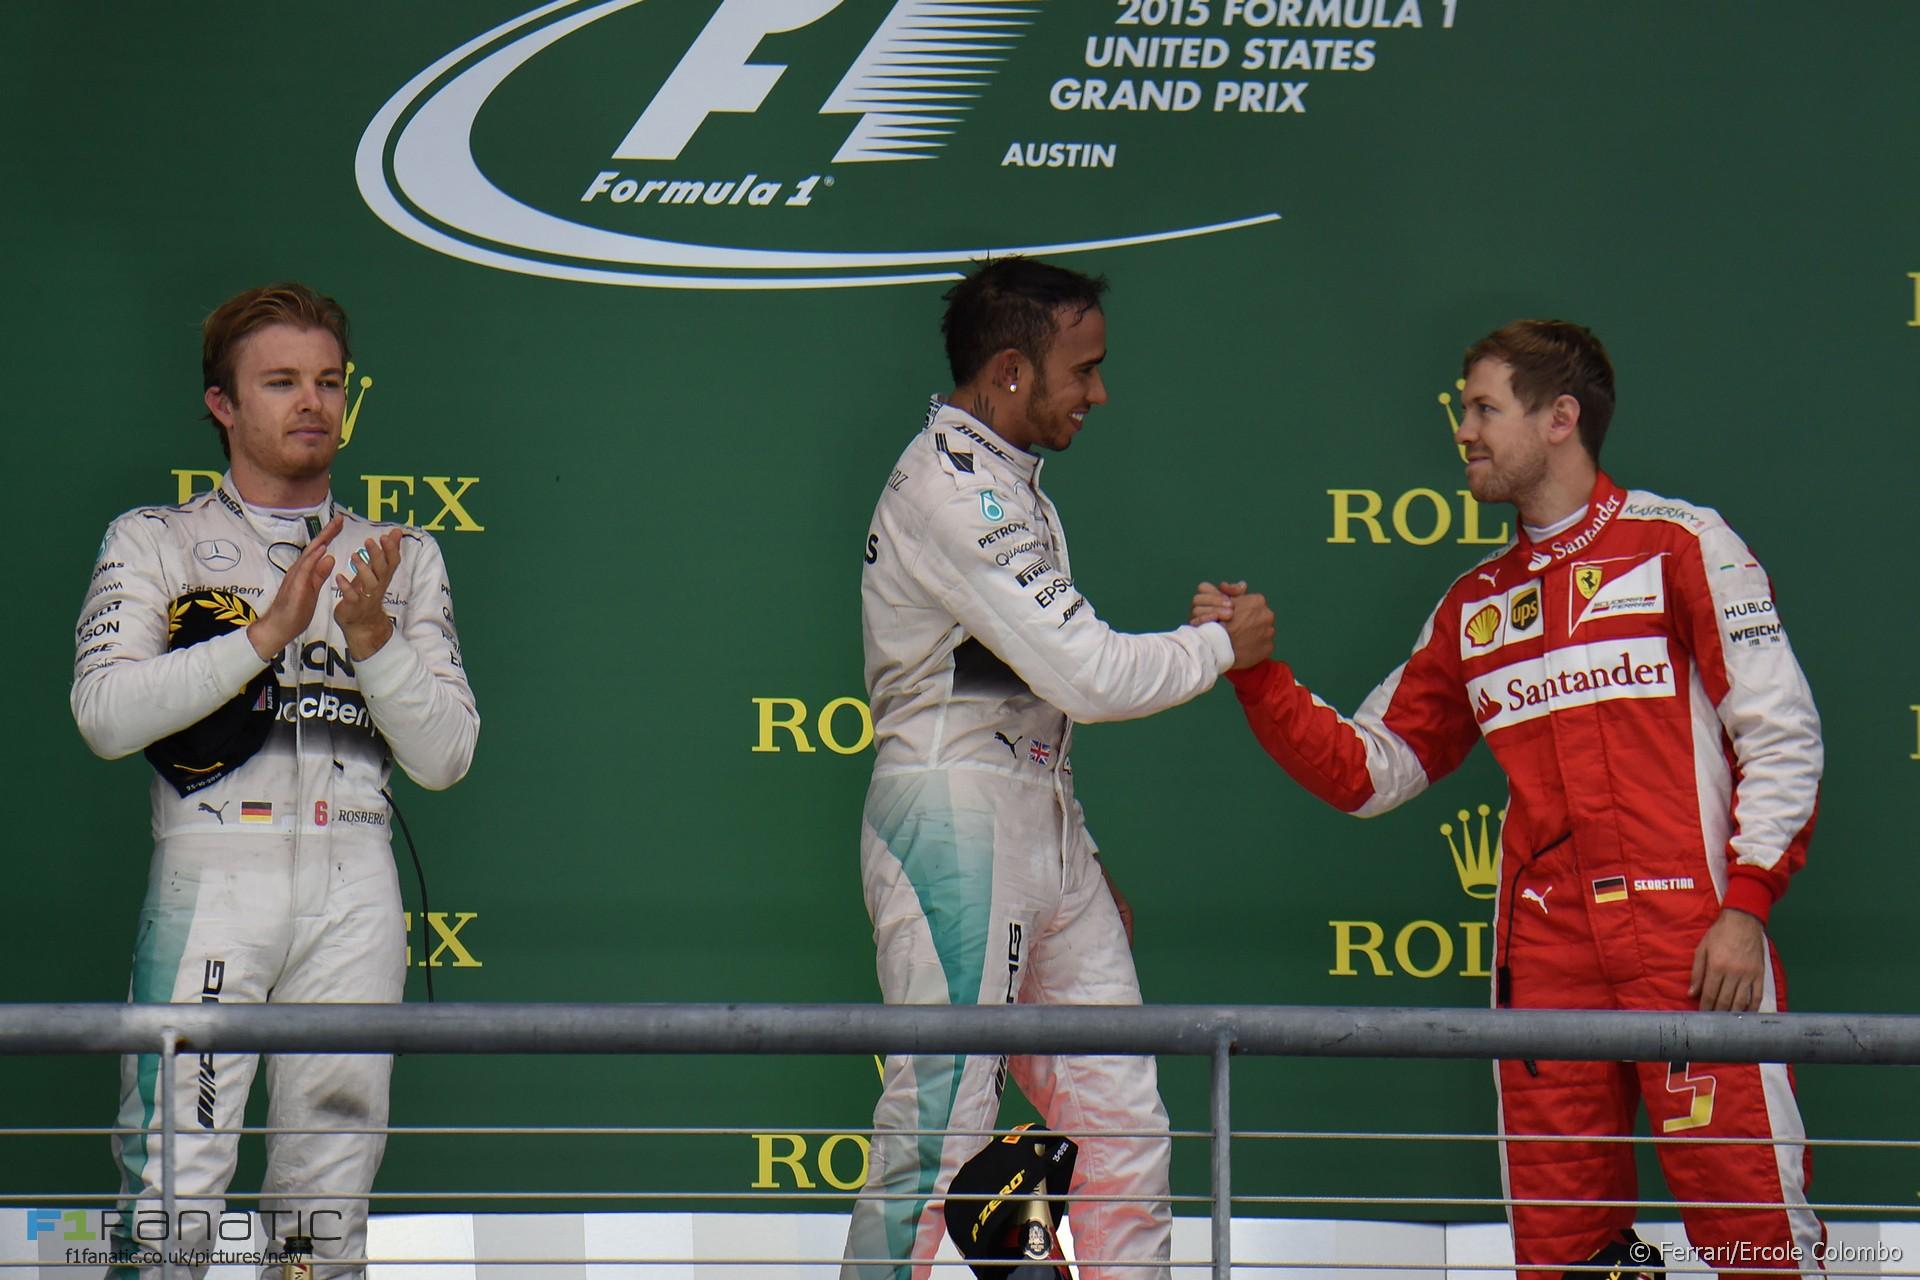 Lewis Hamilton, Sebastian Vettel, Circuit of the Americas, 2015